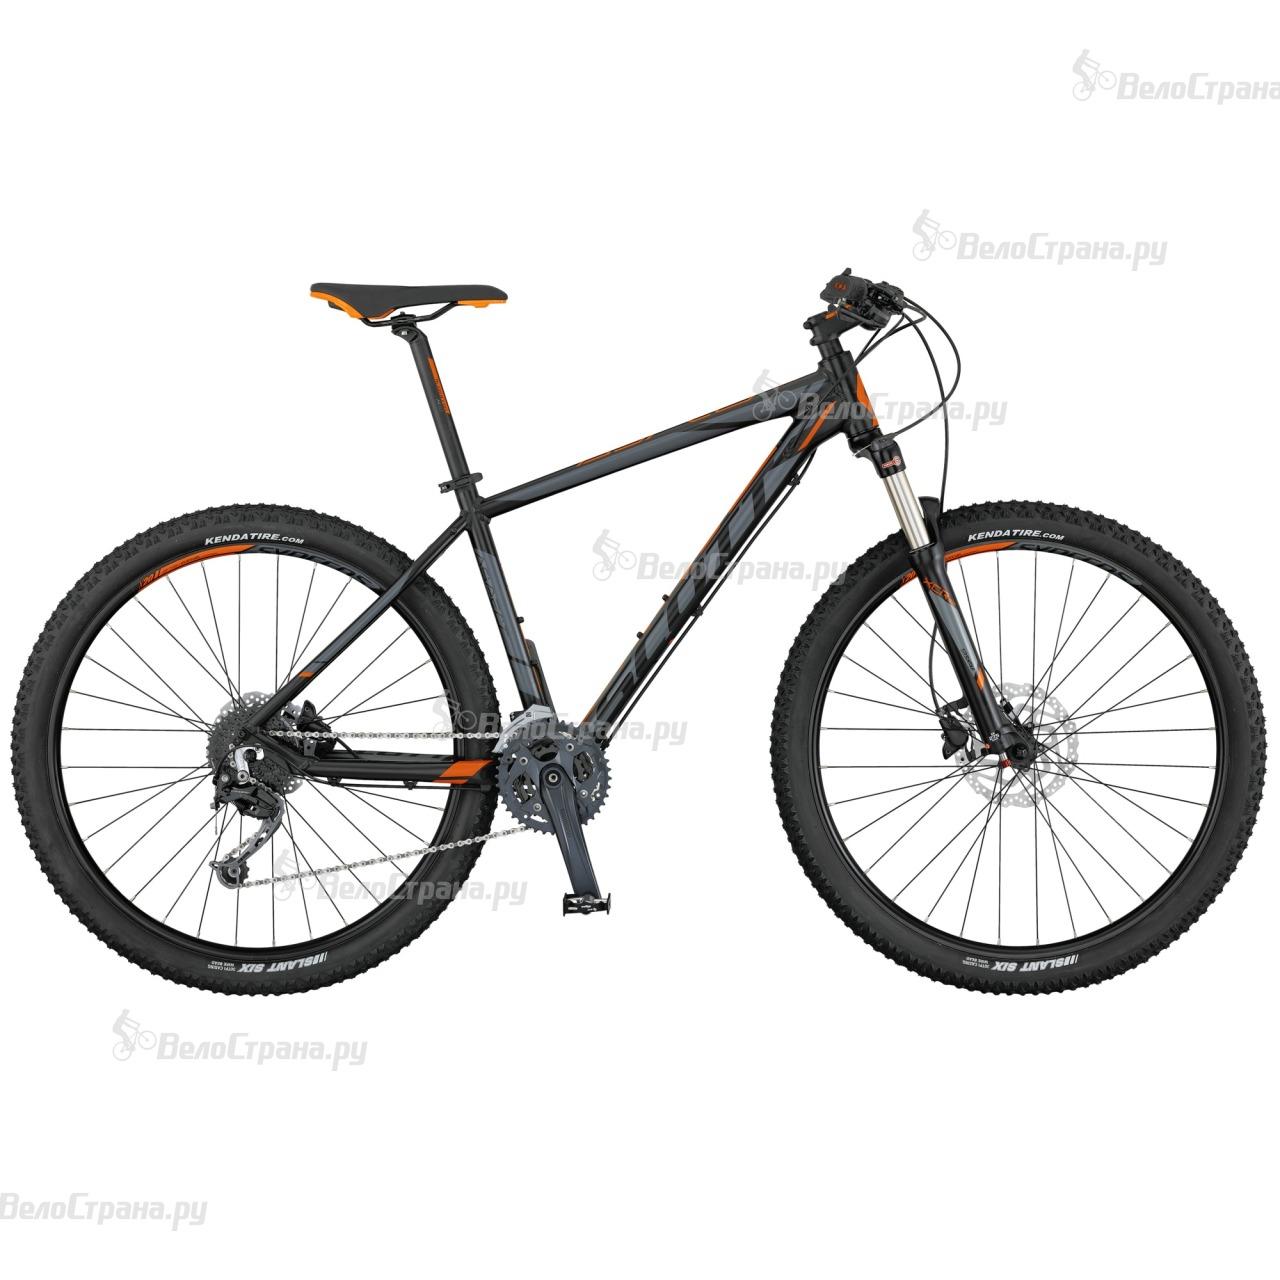 Велосипед Scott Aspect 930 (2017) велосипед scott aspect 930 2016